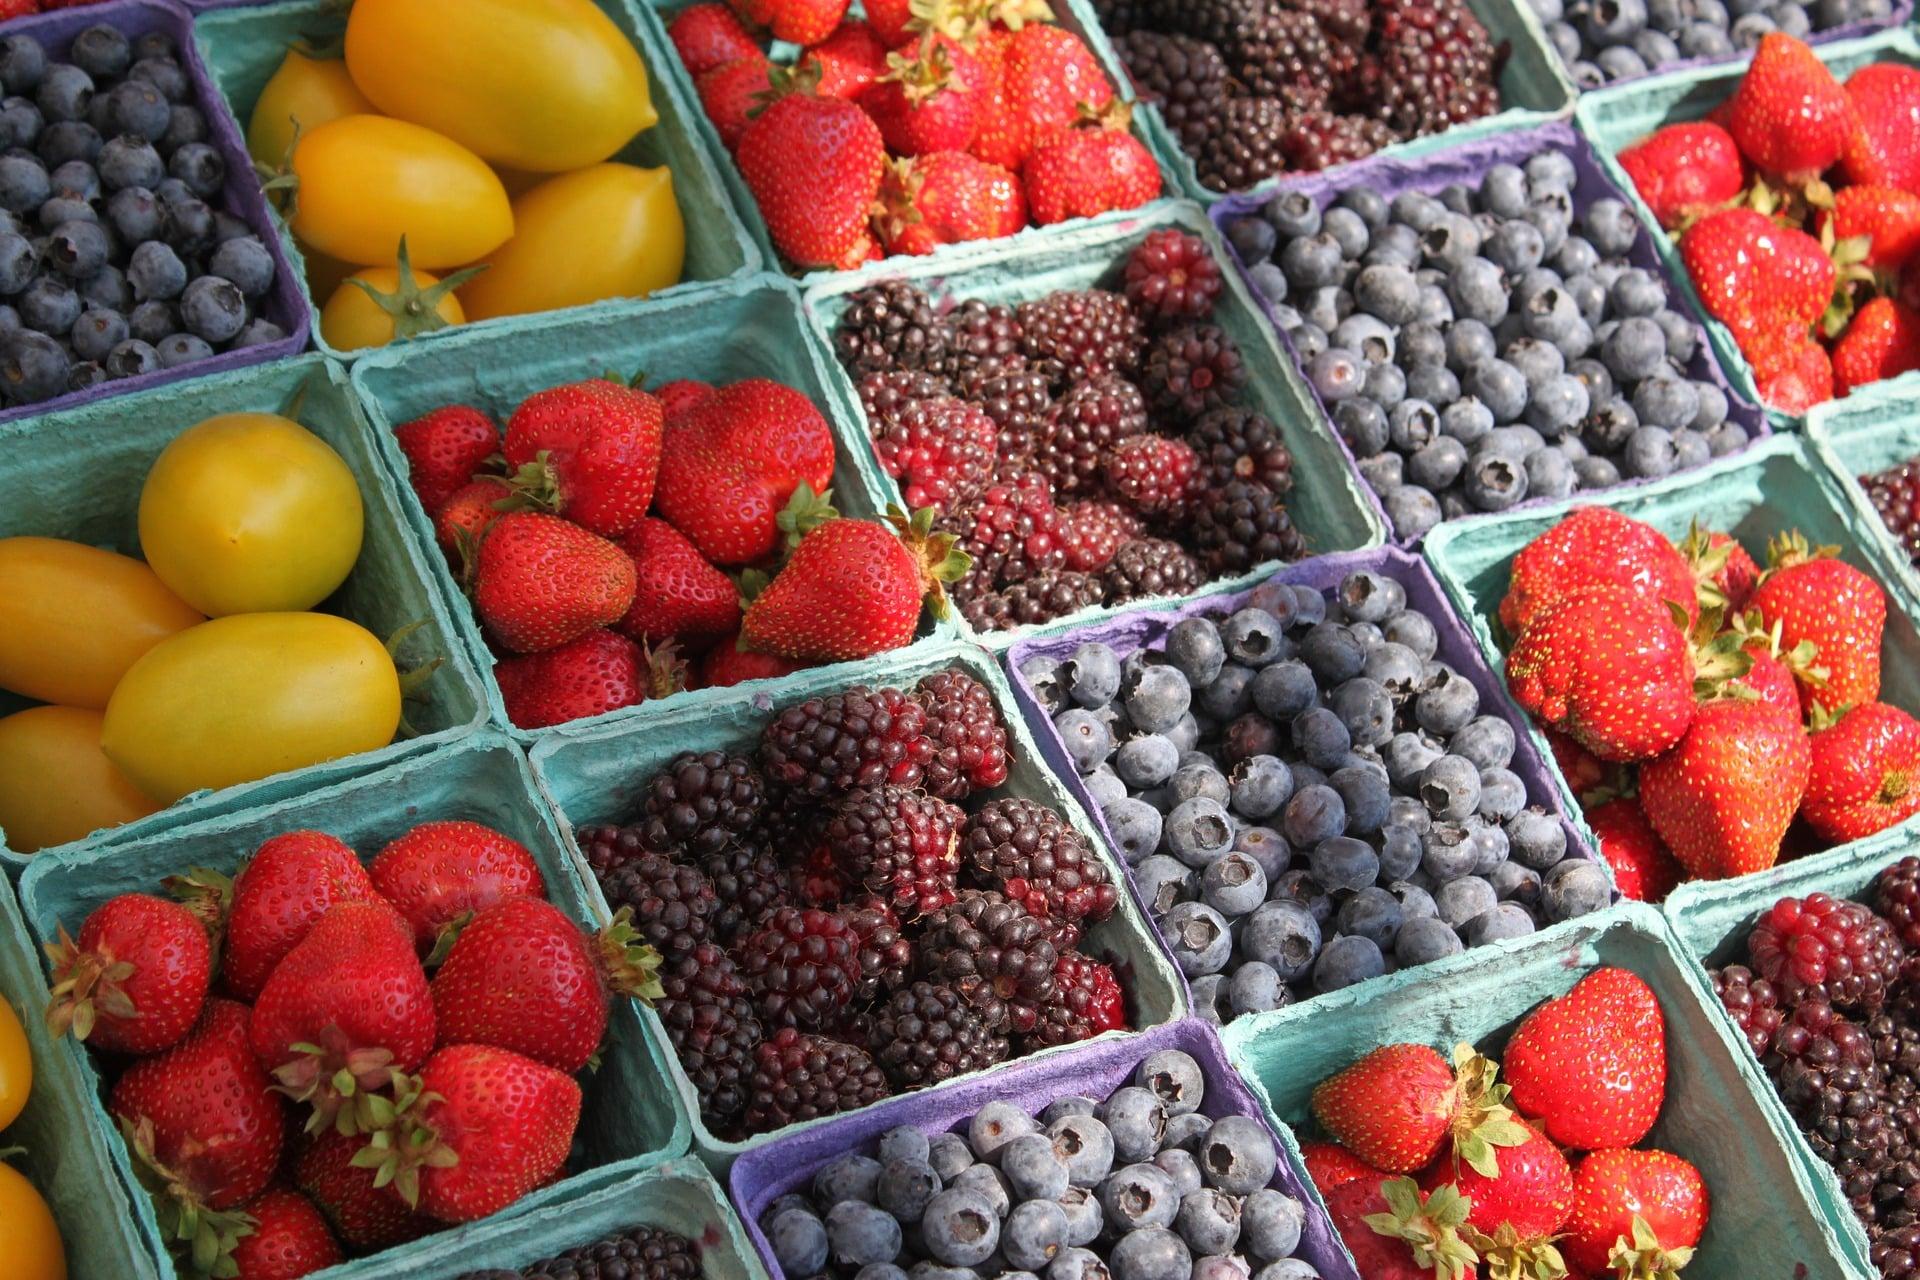 fruits-veggies-for-baby